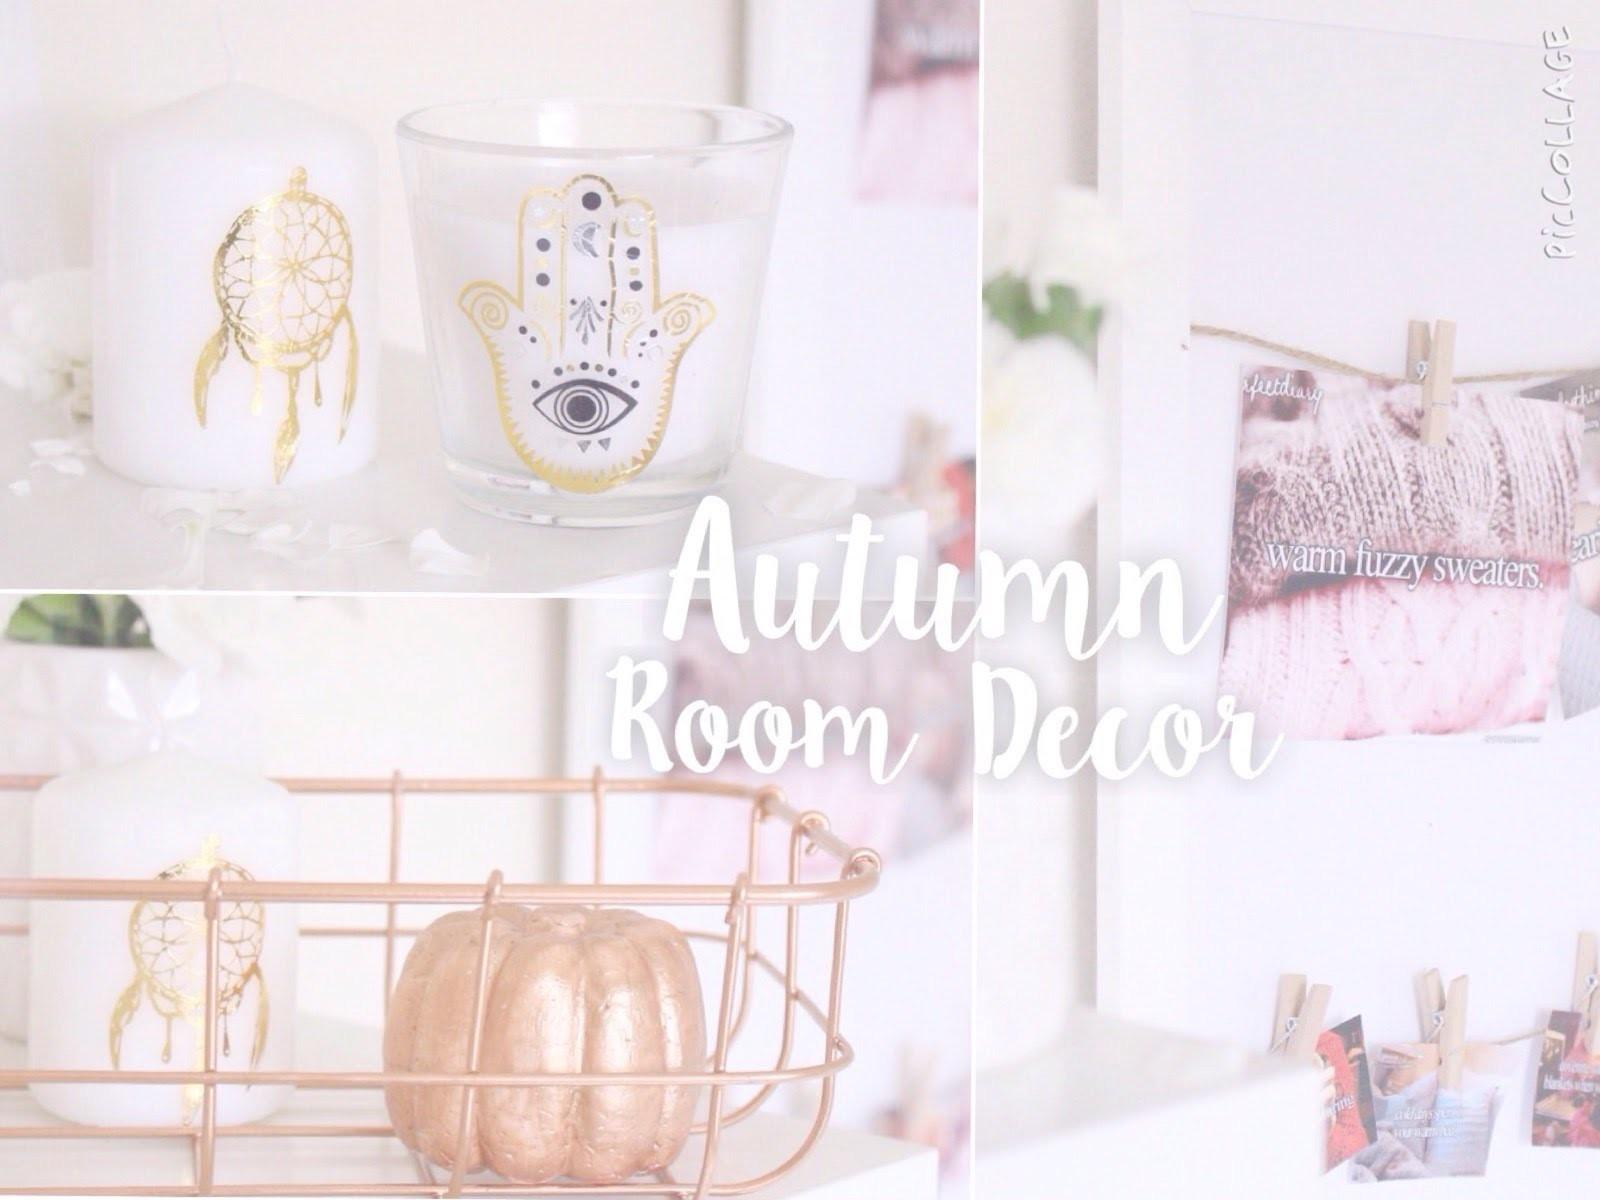 ♡DIY Autumn Room Decor! Easy & Cheap! | Floral Princess♡